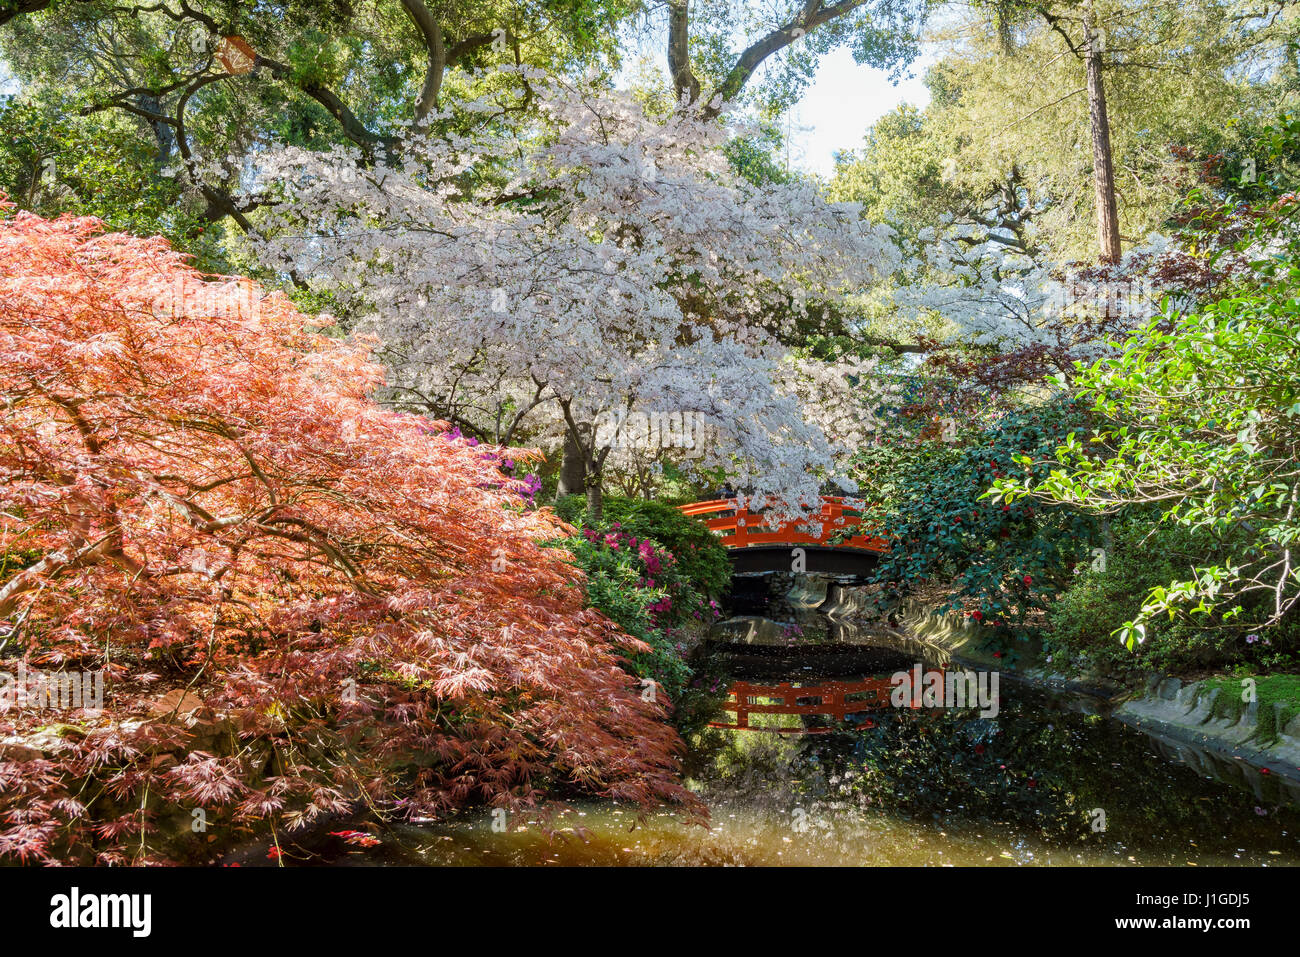 Descanso stock photos descanso stock images alamy Cherry blossom festival descanso gardens